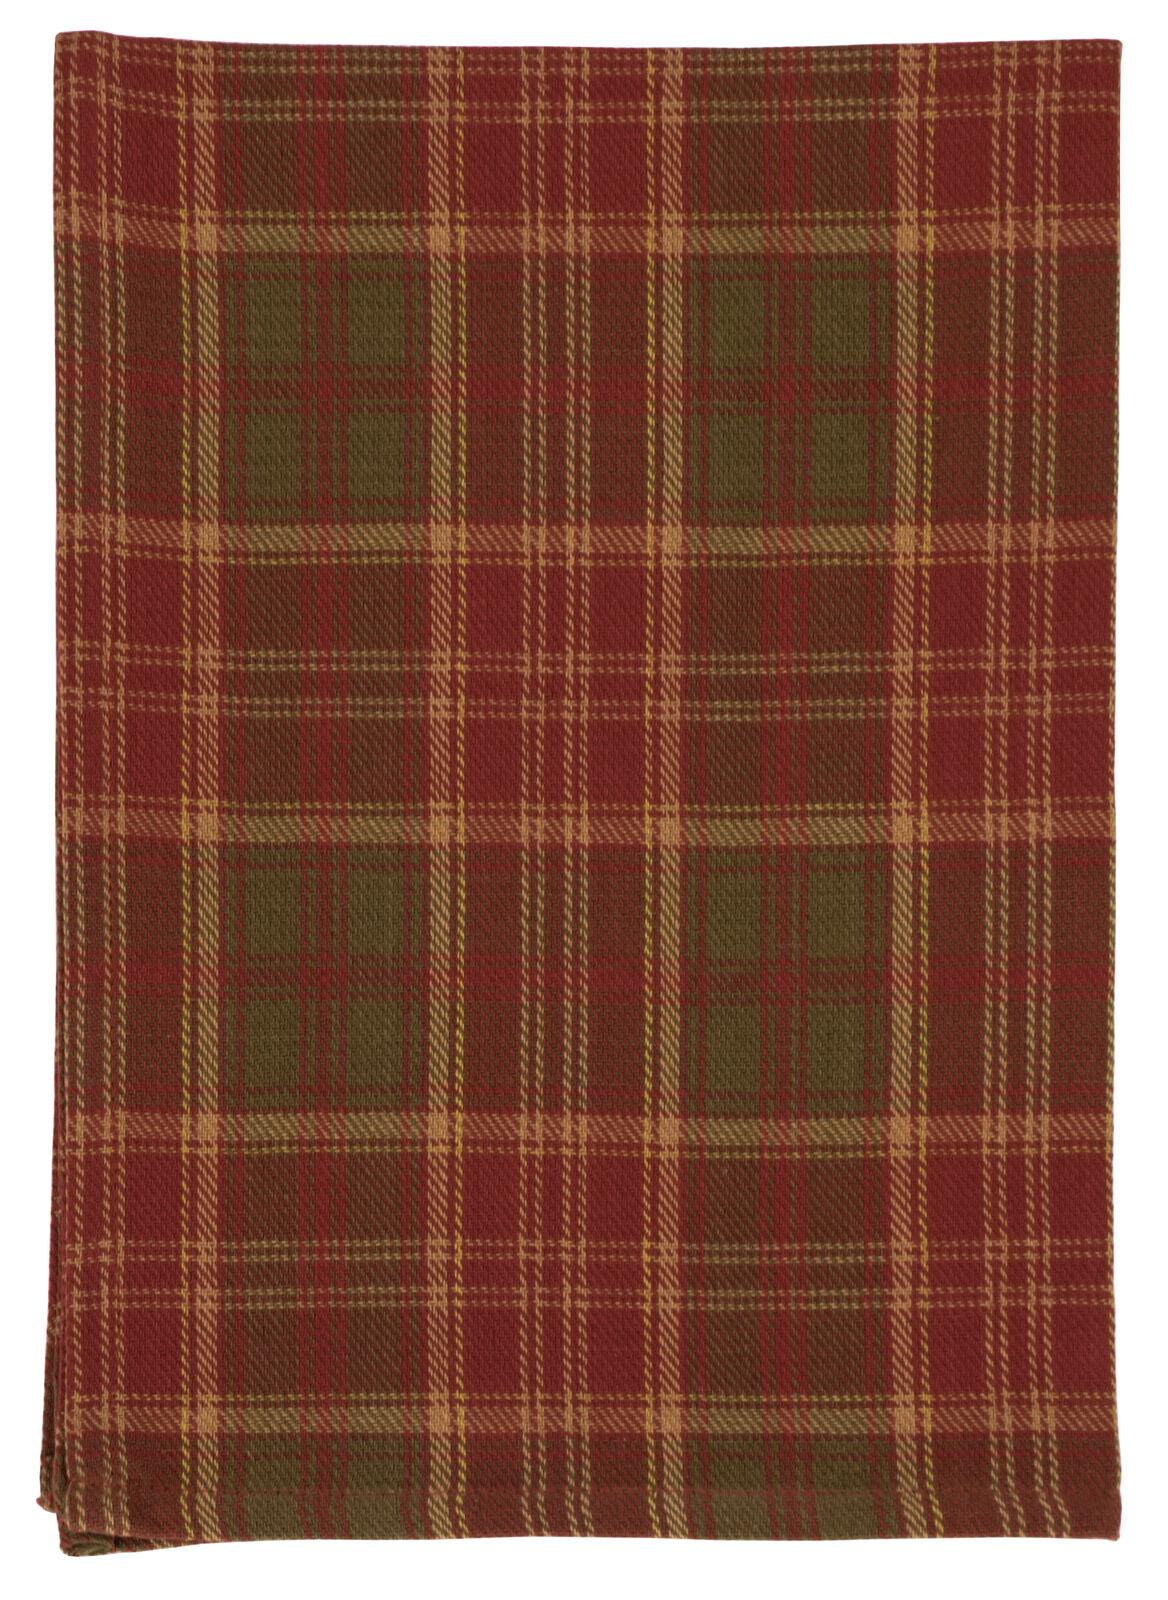 100% Cotton rot & Grün Plaid 20 x28  Dish Towel, Set of 6 - Pineberry